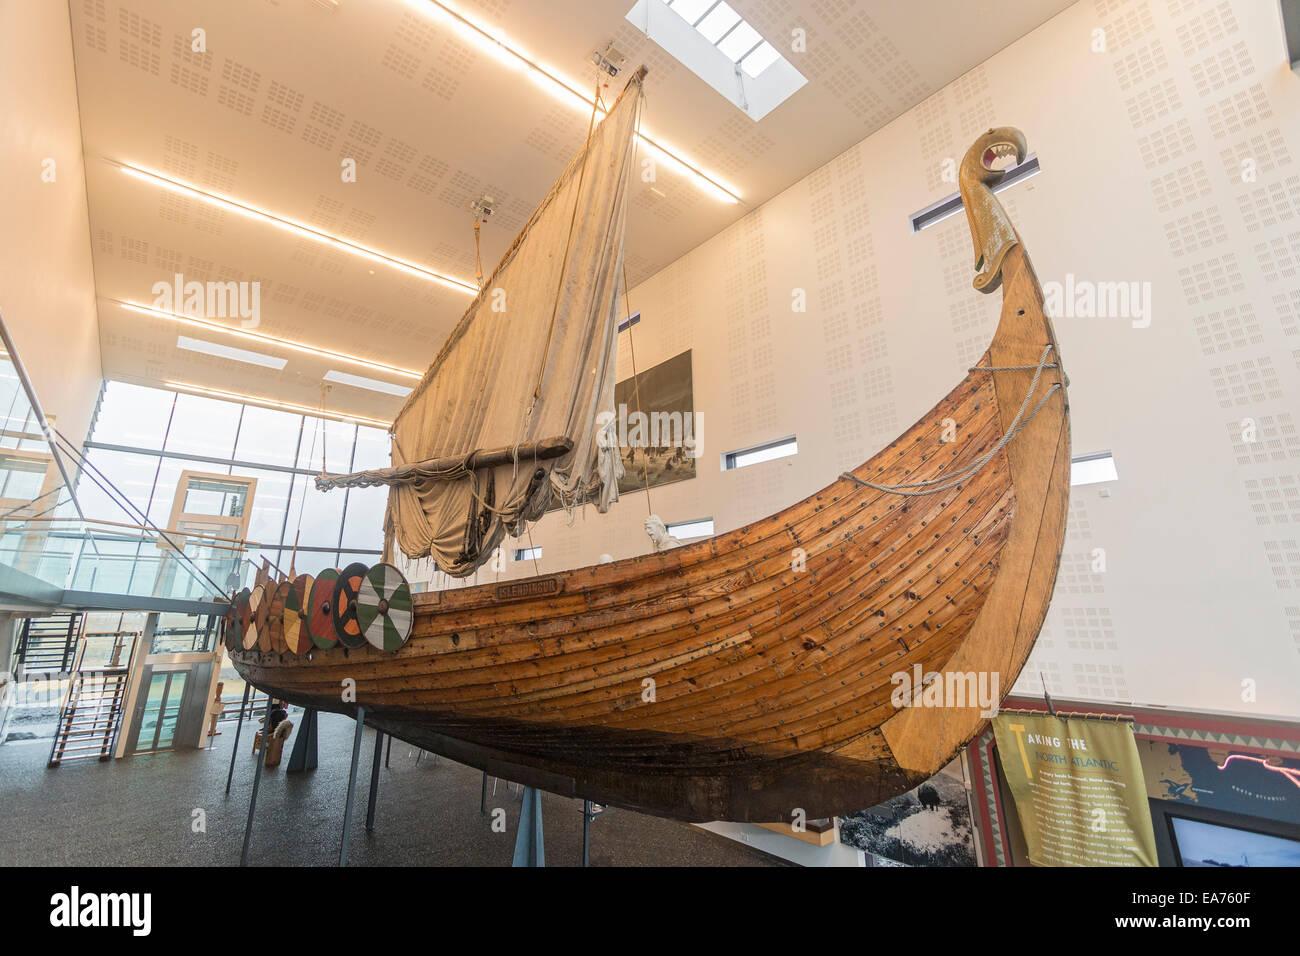 Viking World near Reykjavik, Iceland, has on permanent display the Íslendingur, the replica of the Gokstad - Stock Image